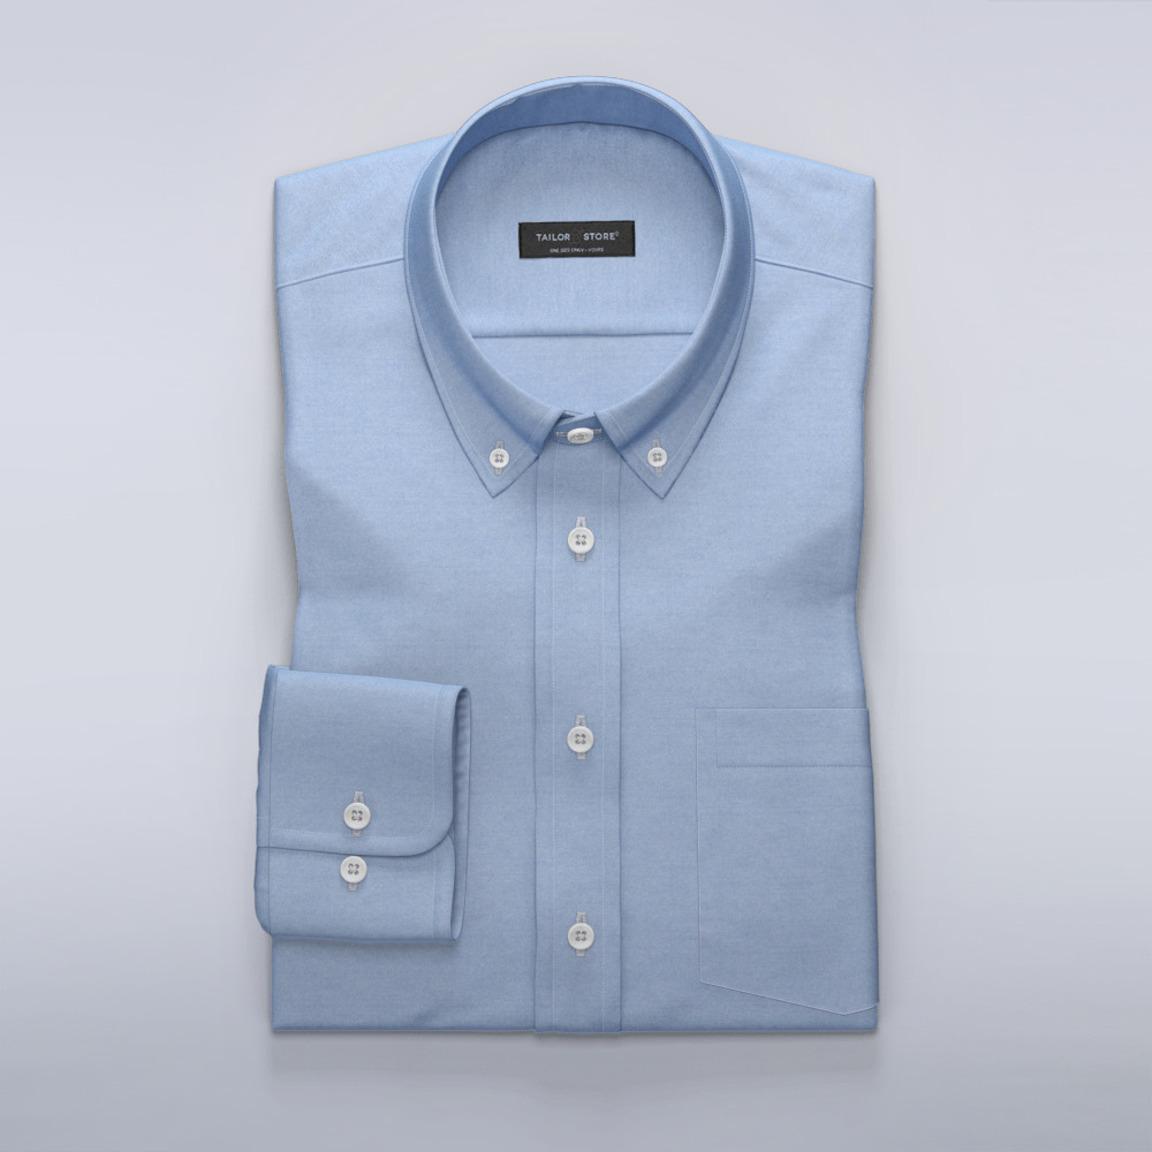 Blaues Oxford Hemd mit Nadelspitze